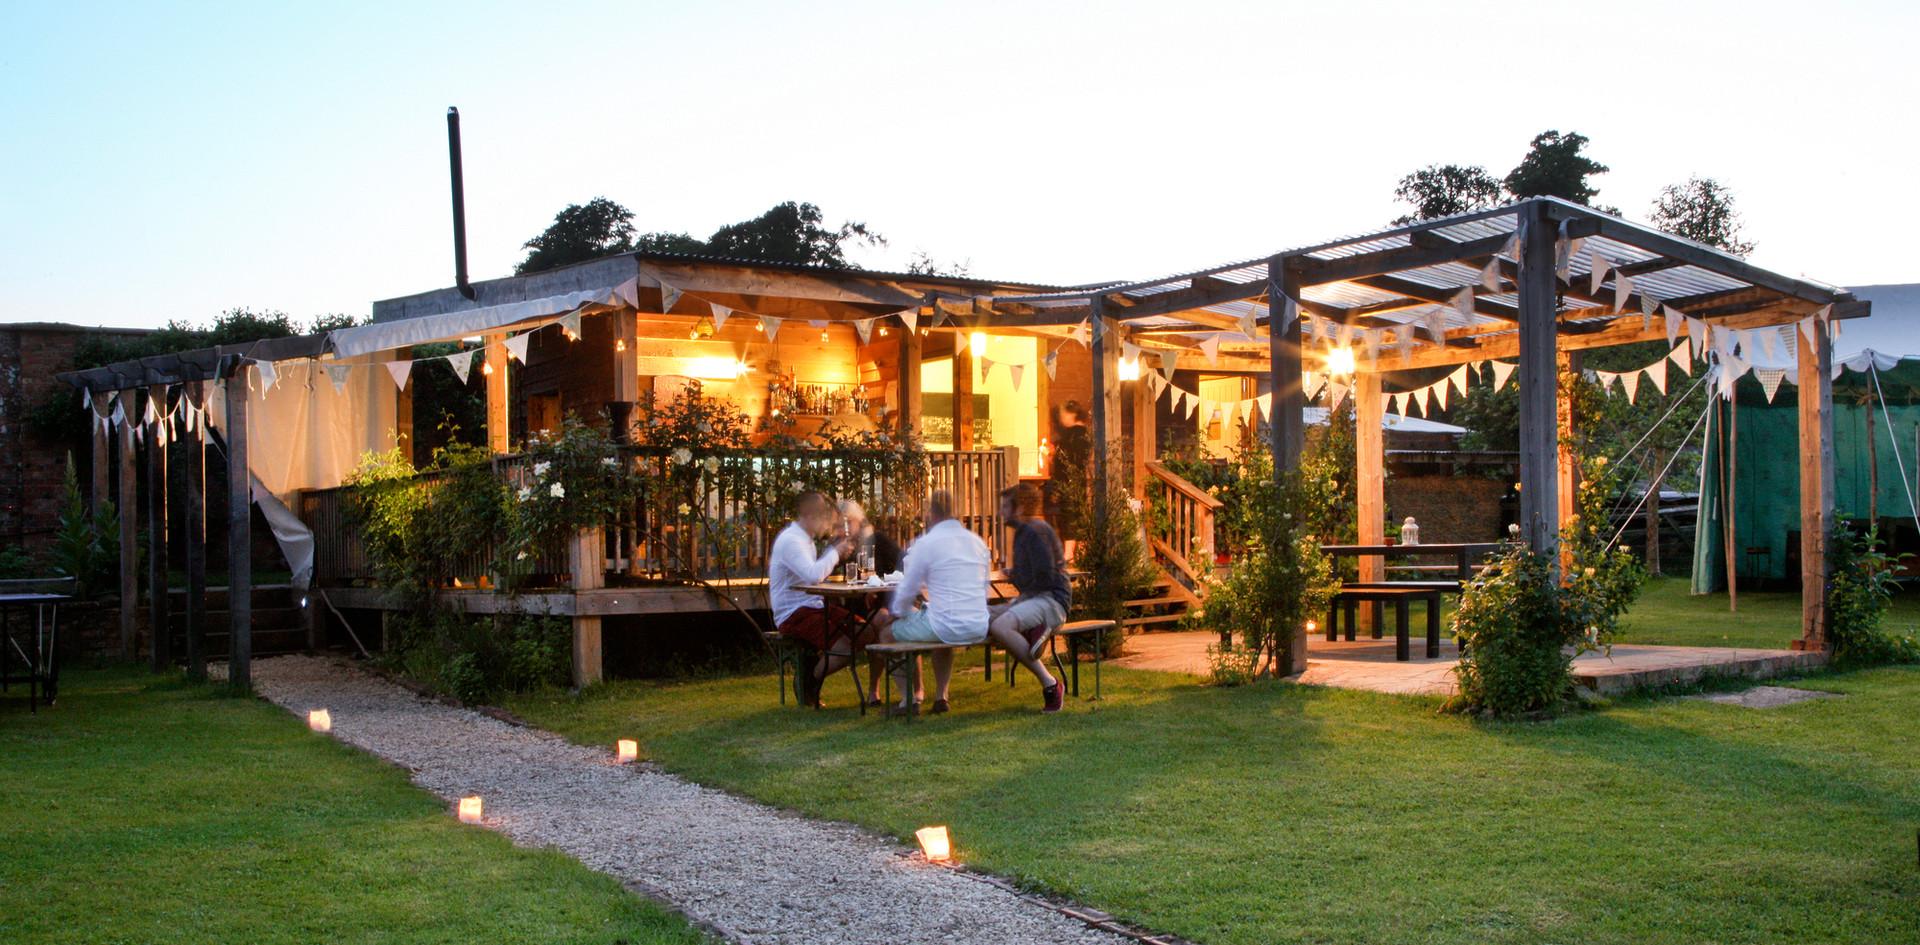 The pavilion pergola bar at dusk